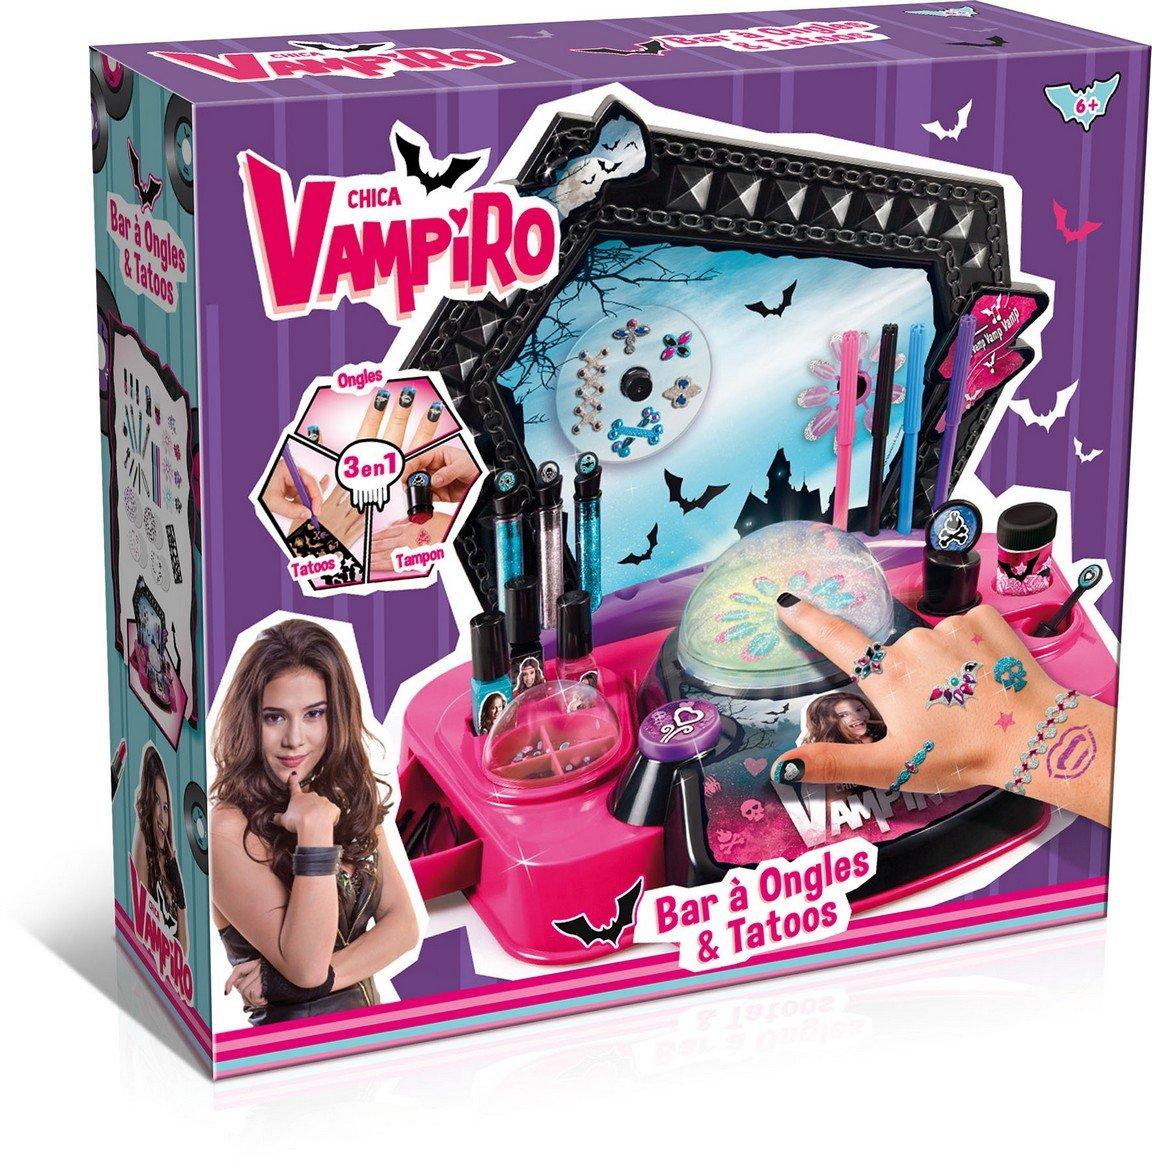 Canal Toys–ct45007–Maquillaje–chica vampiro–Bar de Uñas y Tatoos